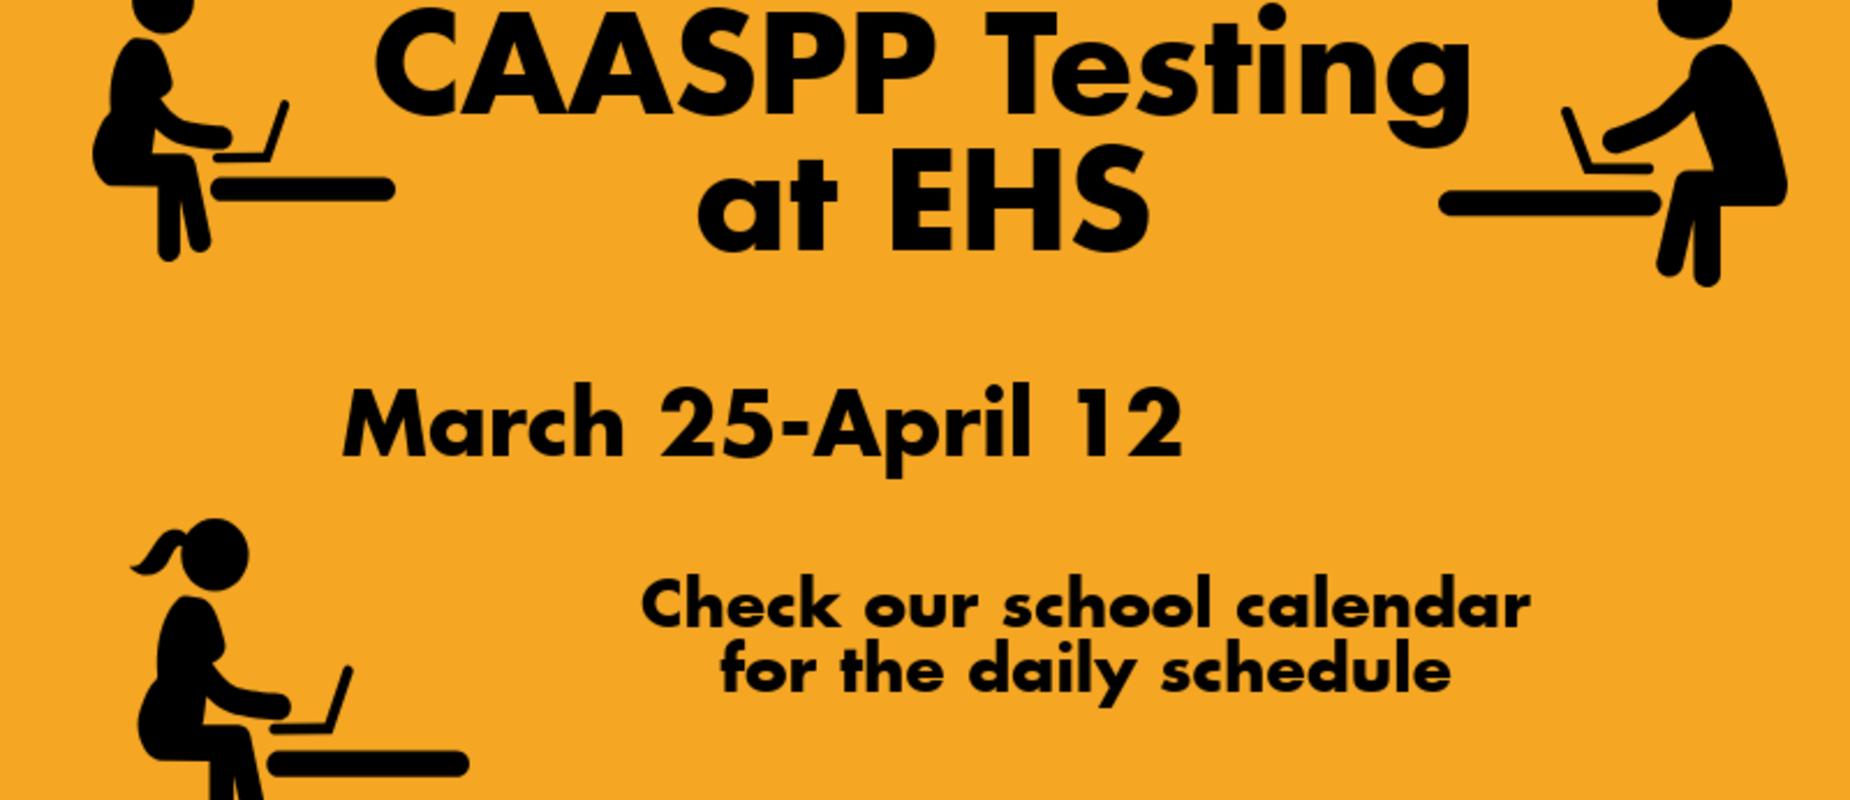 CAASPP Testing March 25-April 12